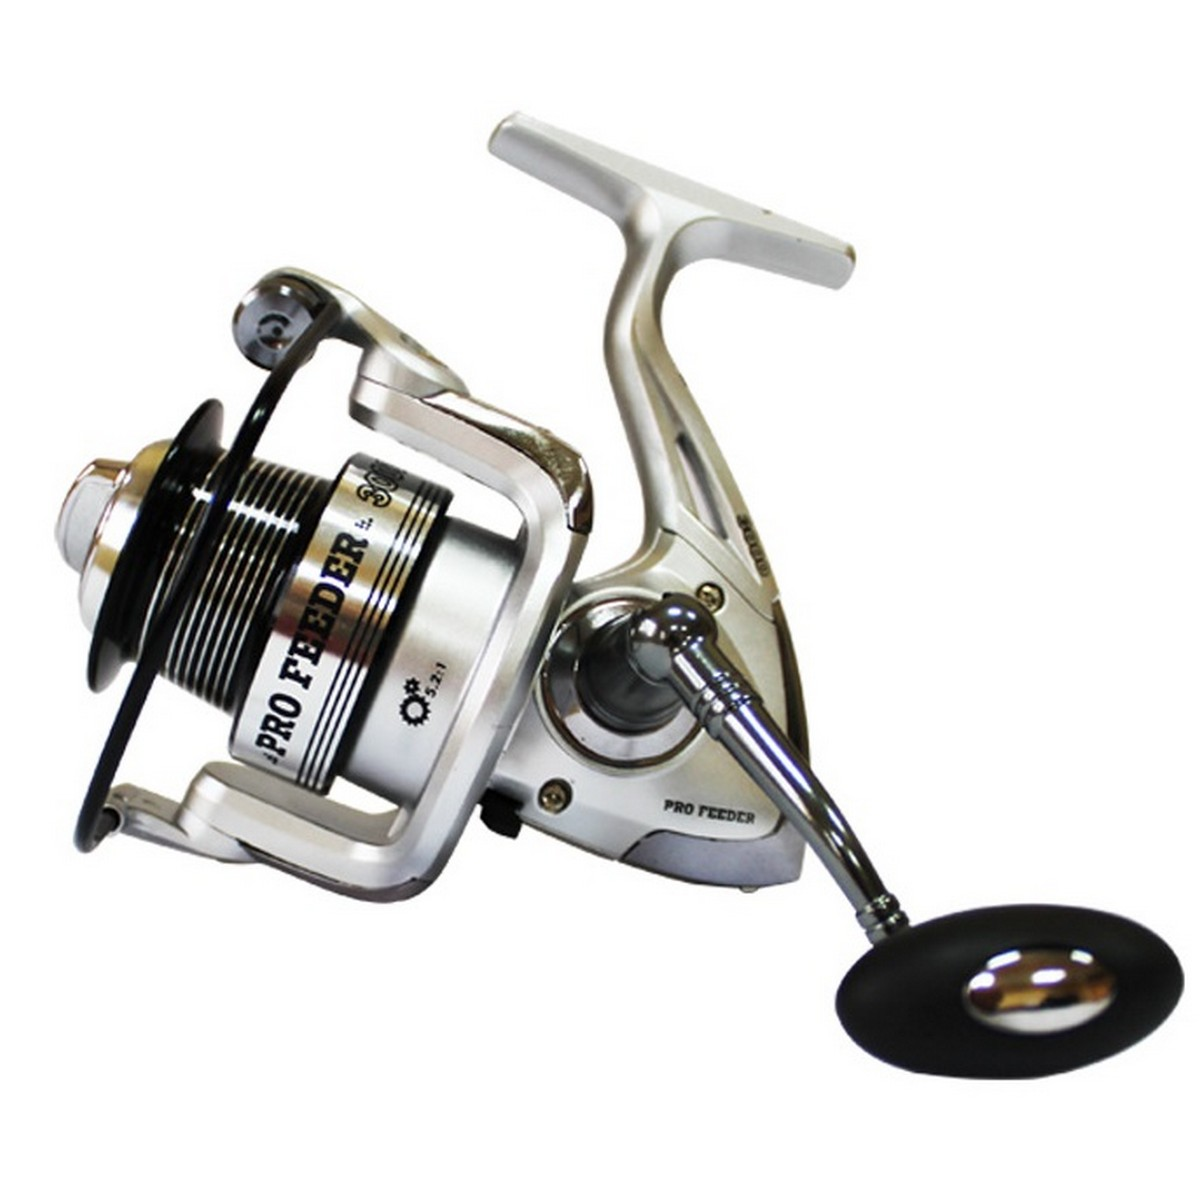 Риболовна макара Filstar Pro Feeder